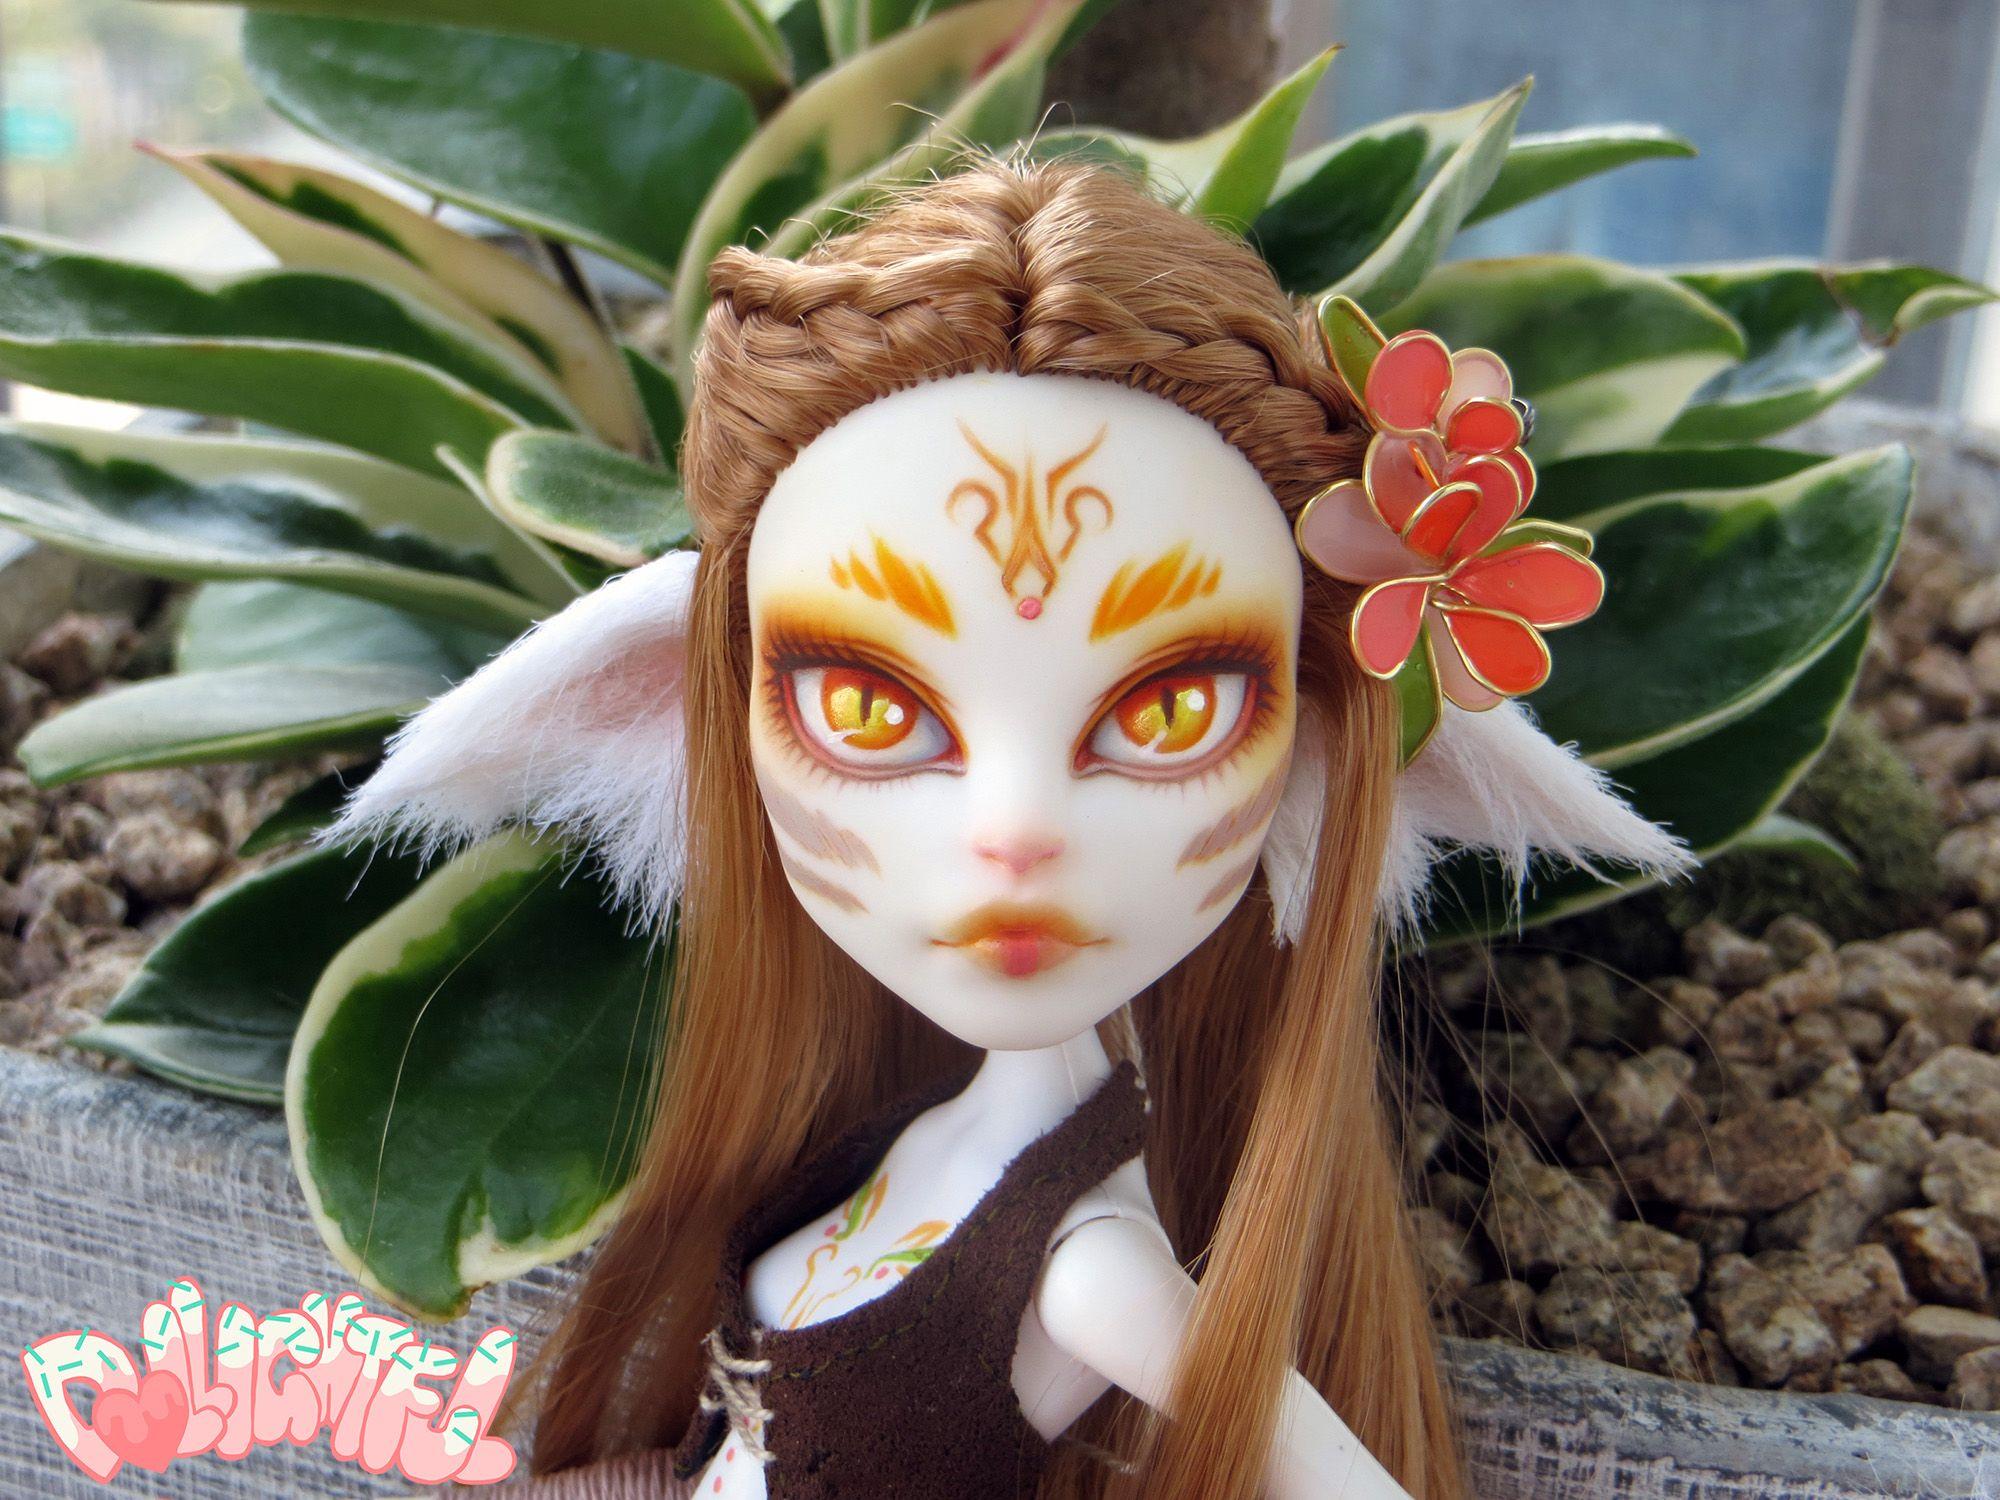 Custom Catrine DeMew Monster High Avatar Wild Cat Nature Spirit Kitsune Fox Repaint OOAK Doll by Dollightful